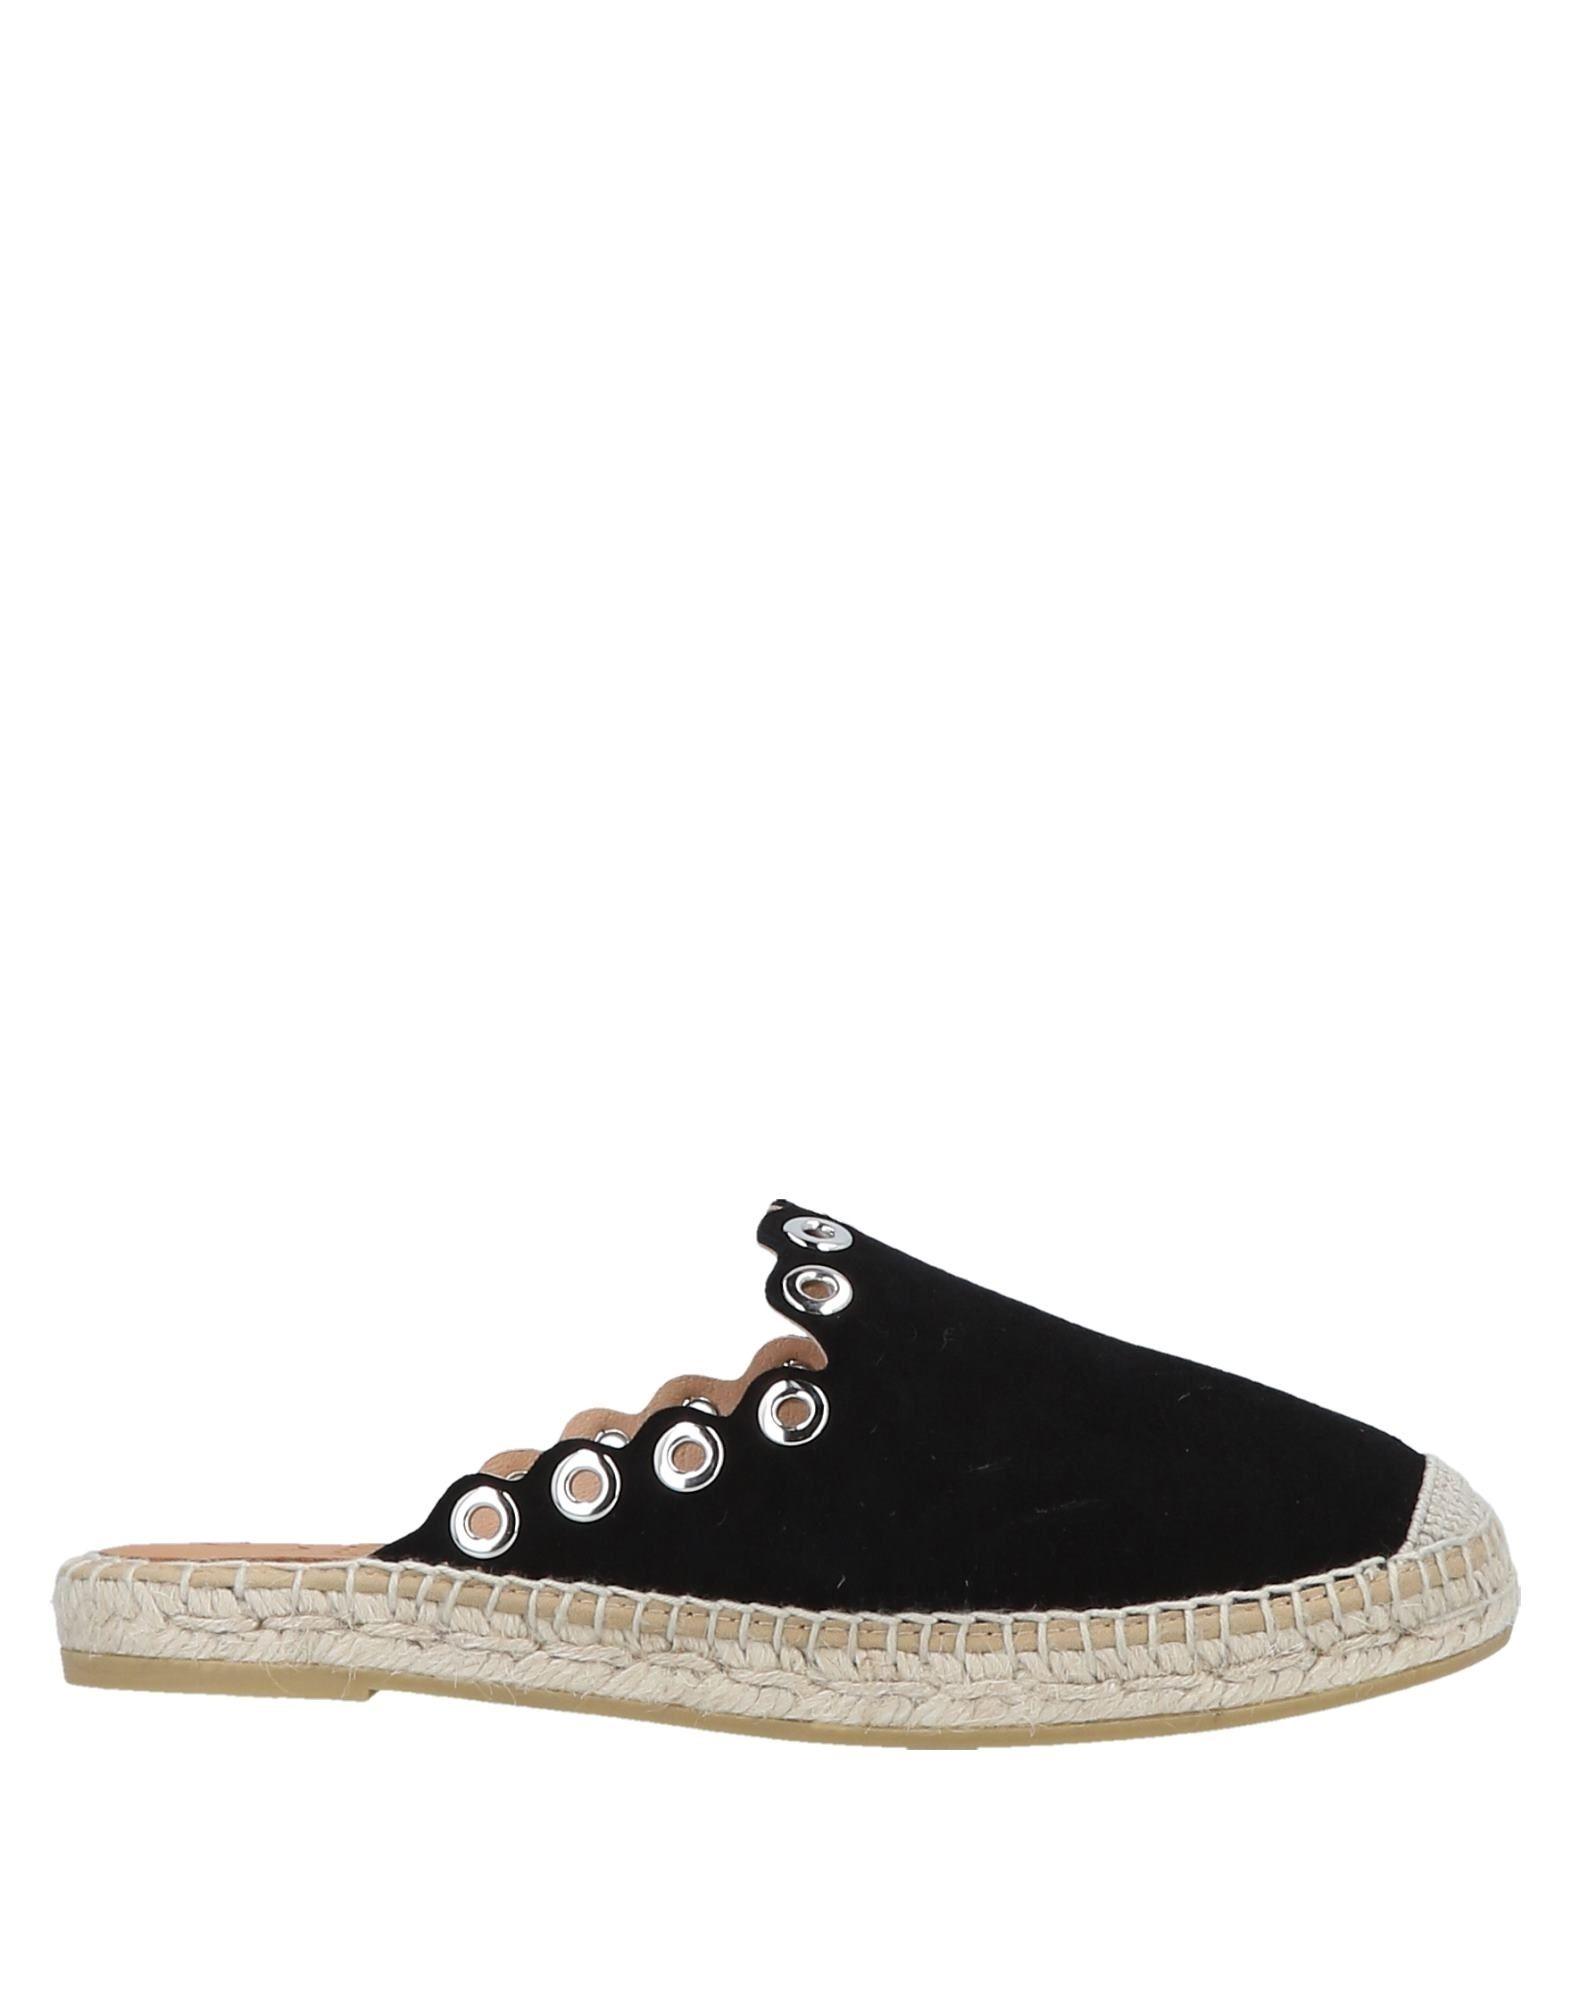 Kanna Pantoletten Qualität Damen  11570874DS Gute Qualität Pantoletten beliebte Schuhe cfedc1